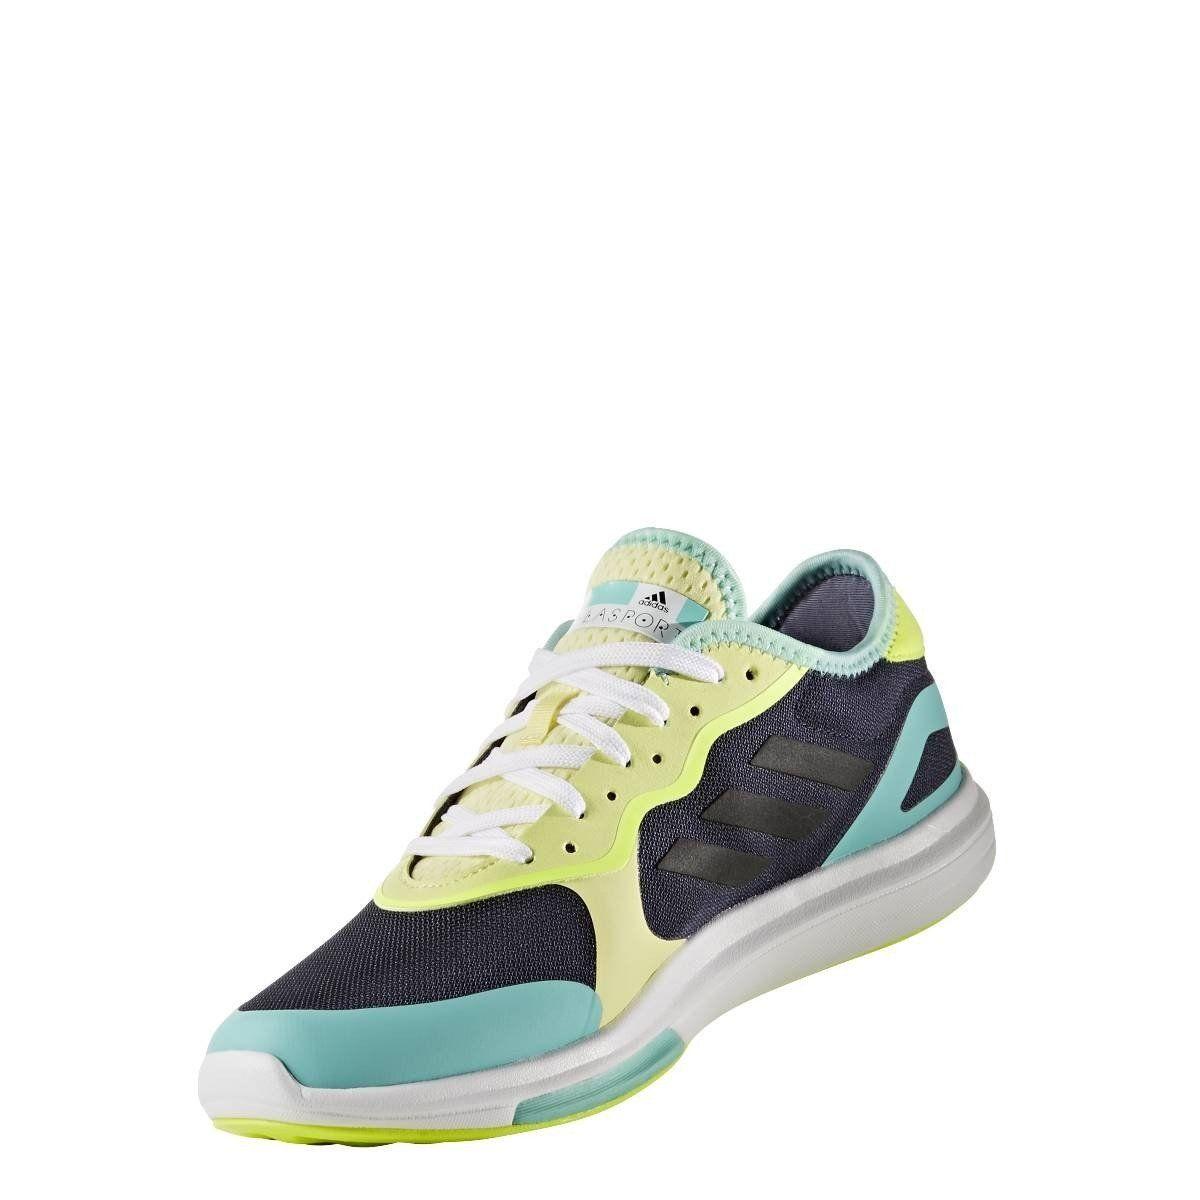 37b2846e2f663 adidas Originals Stella McCartney Yvori Womens  Amazon.co.uk  Shoes   Bags